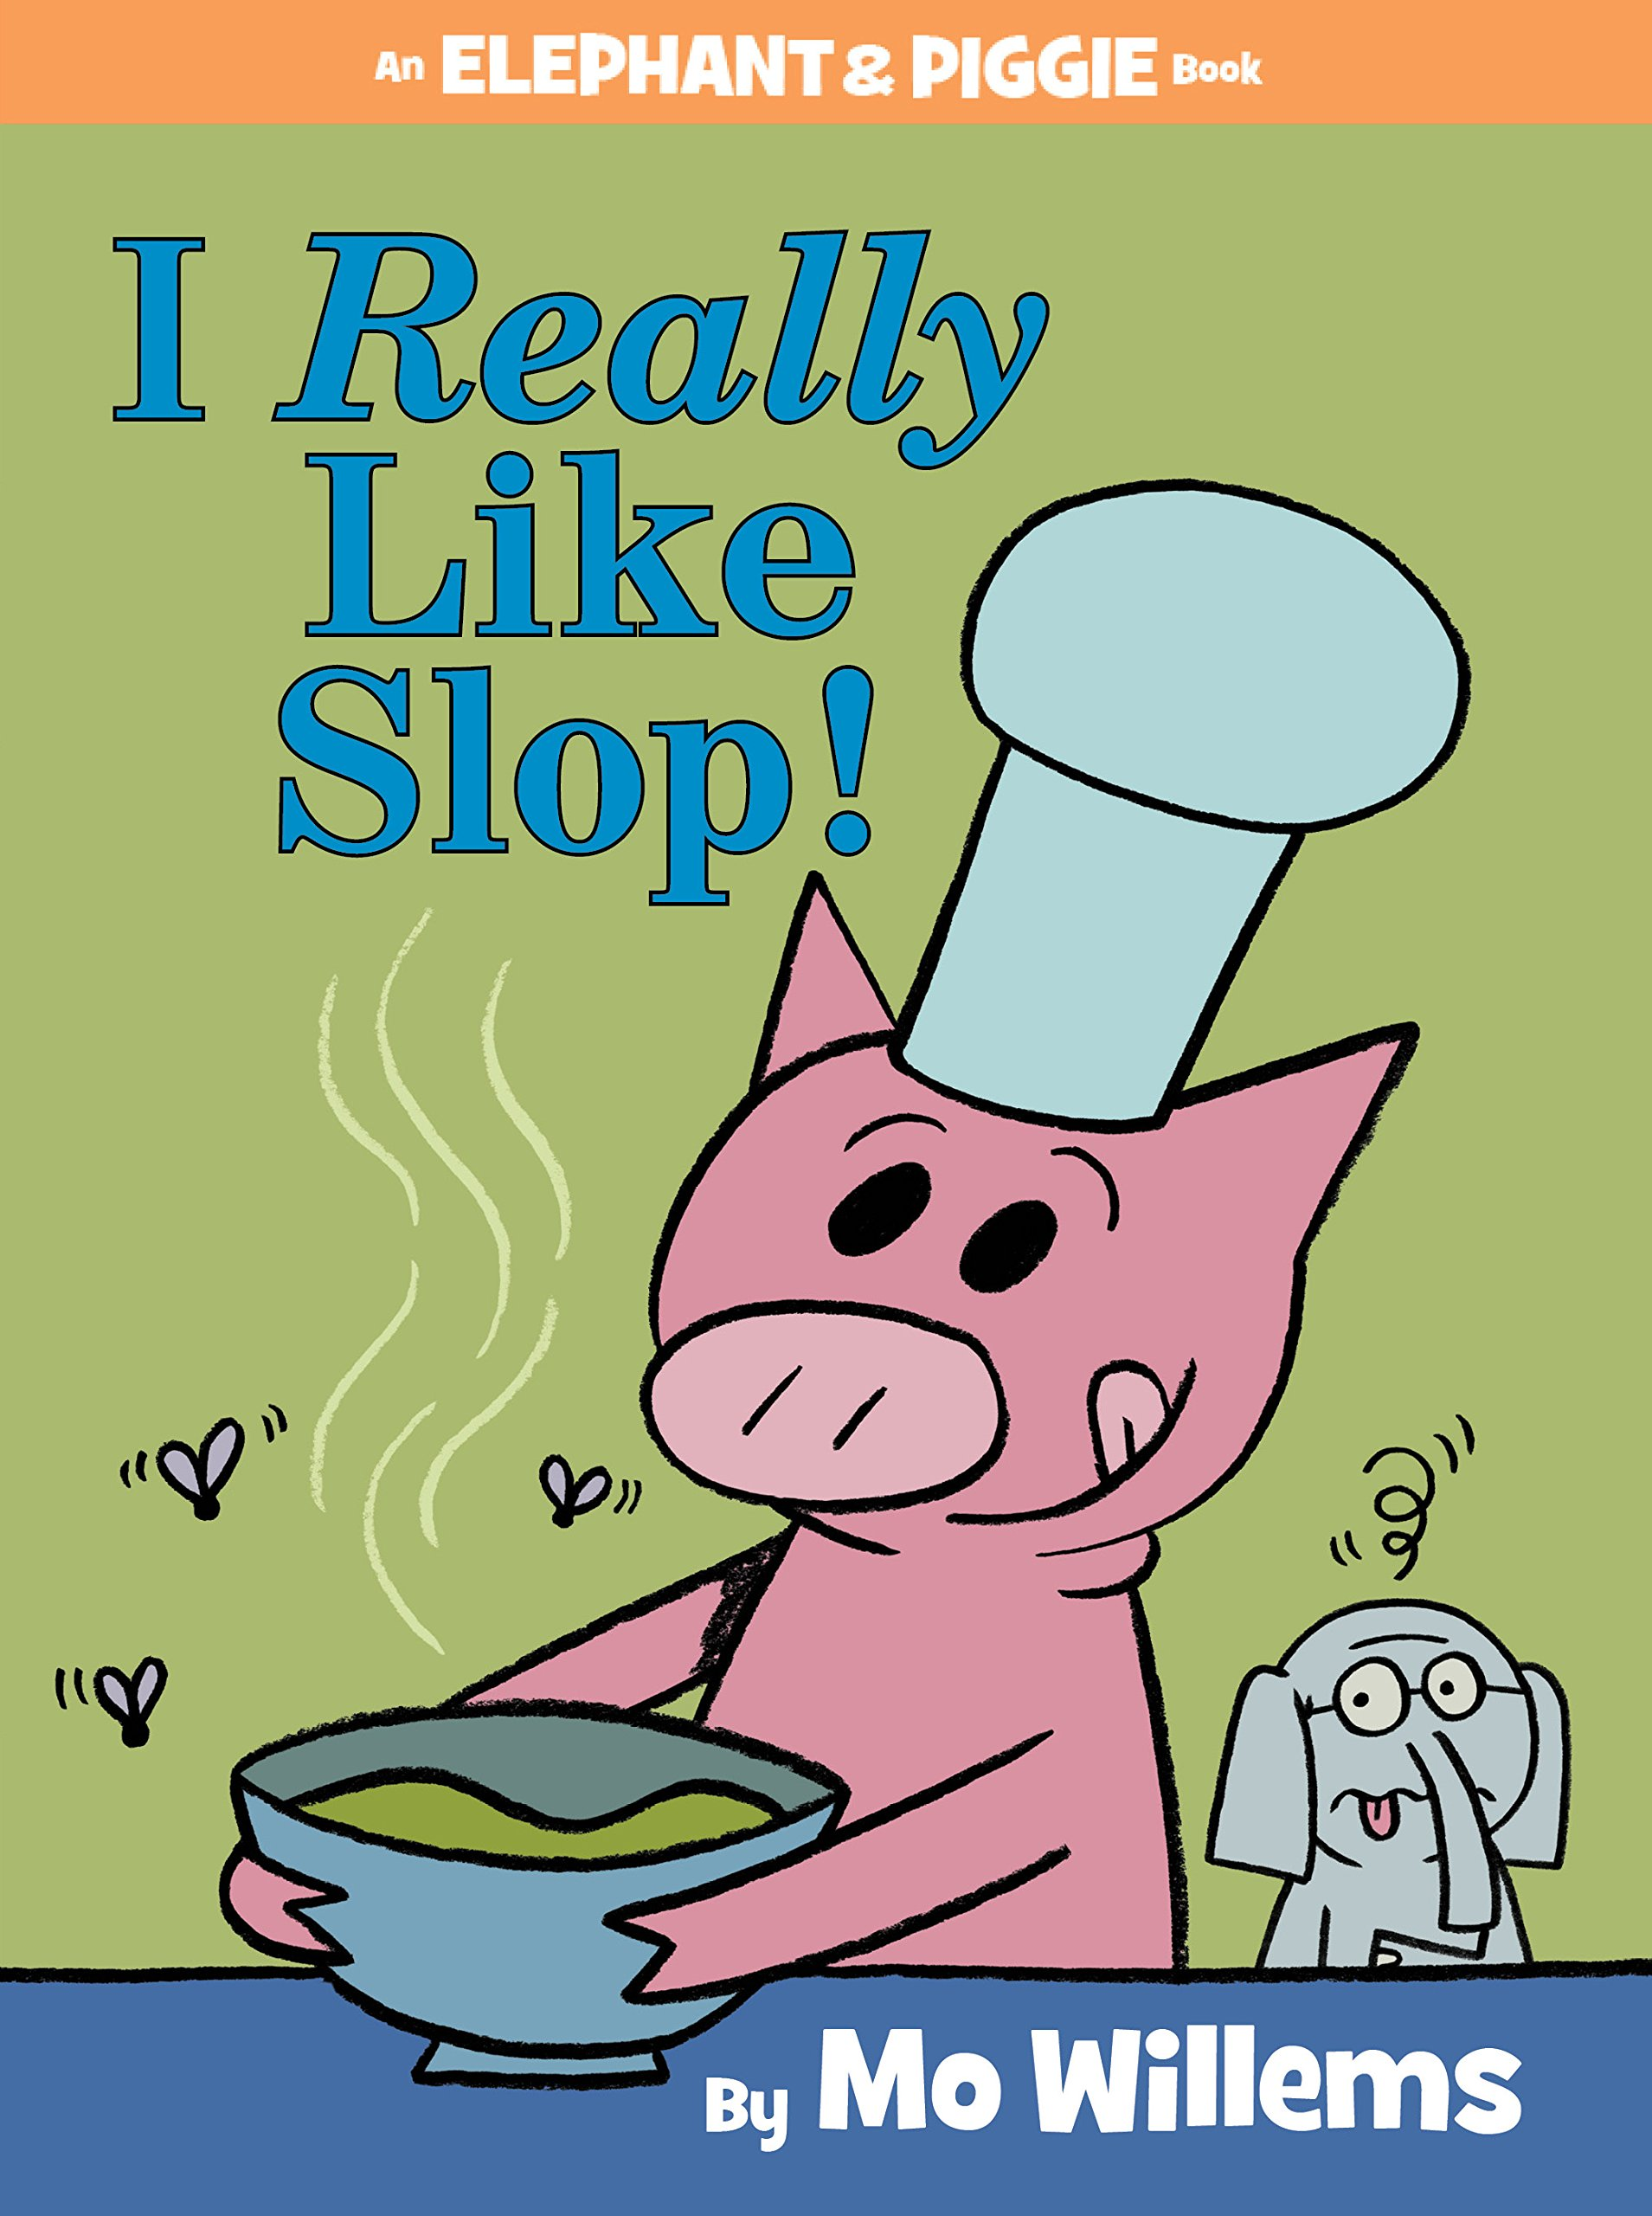 An Elephant & Piggie Biggie! (An Elephant and Piggie Book)